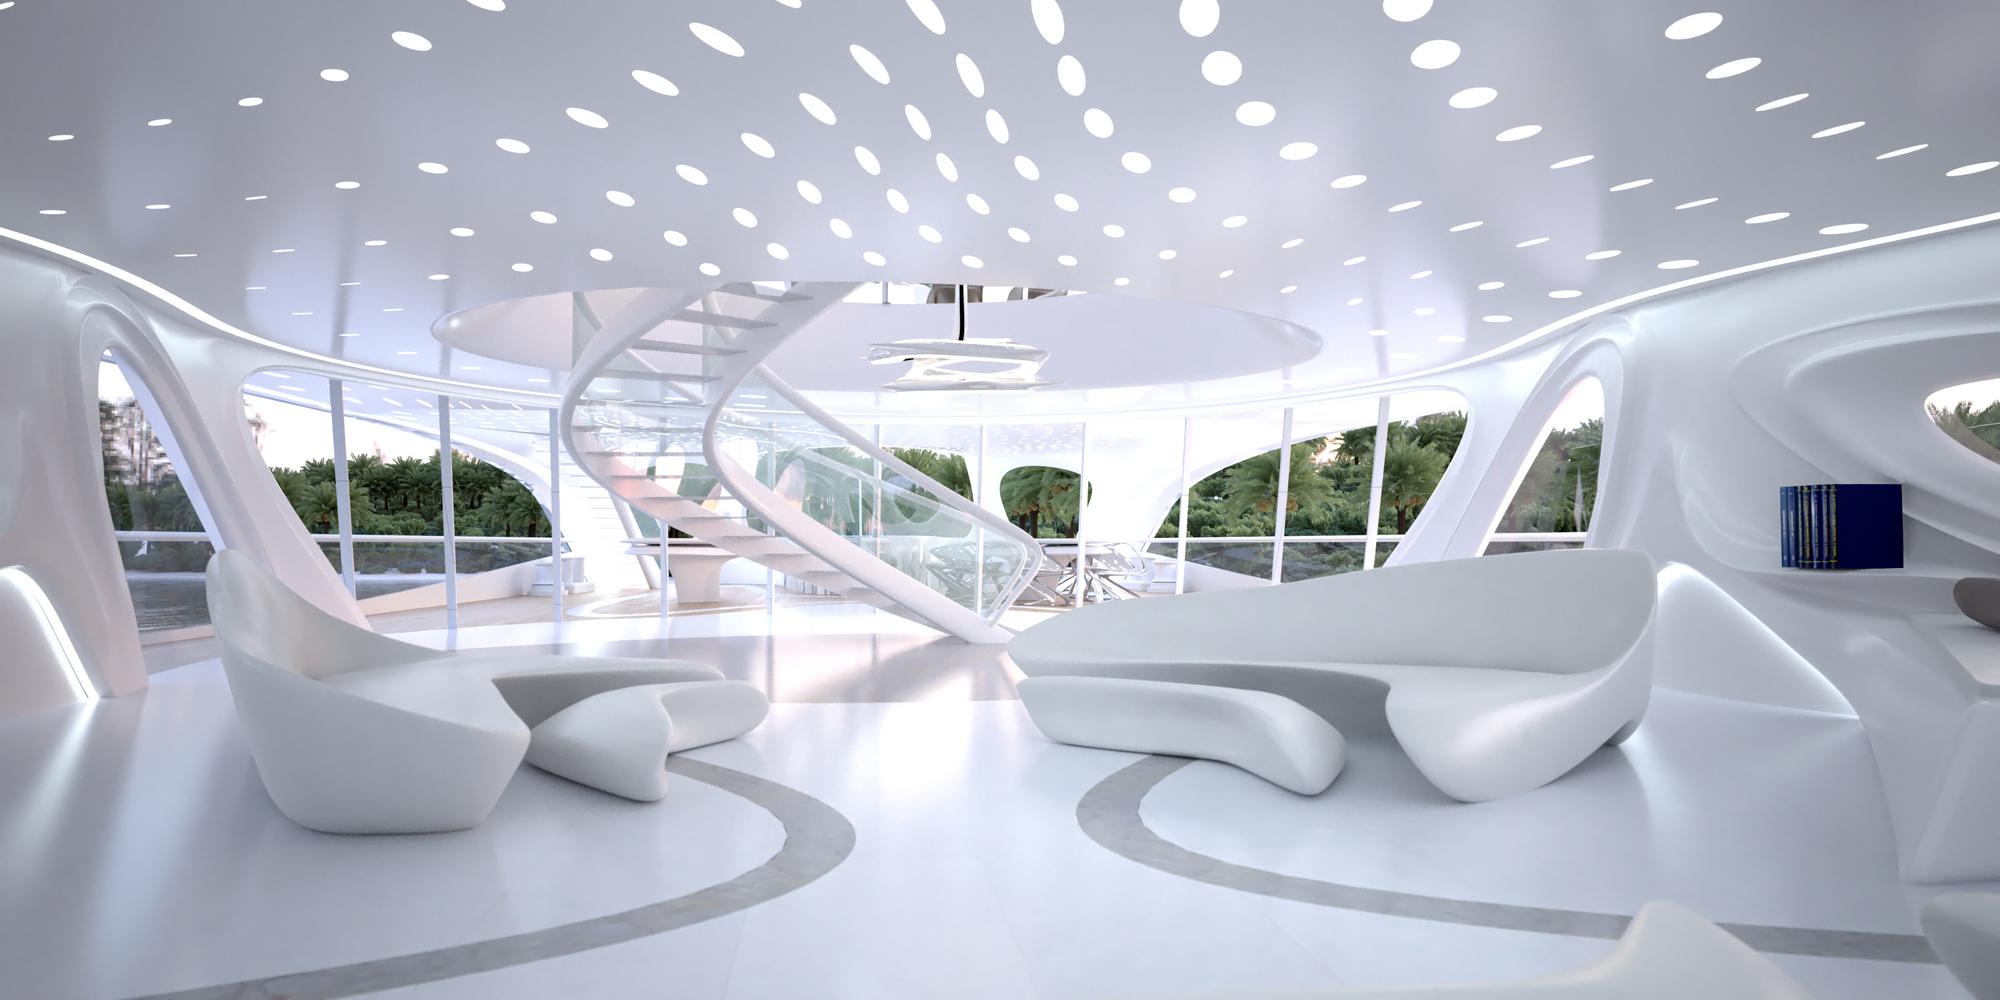 Superyacht for Blohm+Voss, Year Built: currently being designed, Interior Designer: Zaha Hadid Architect